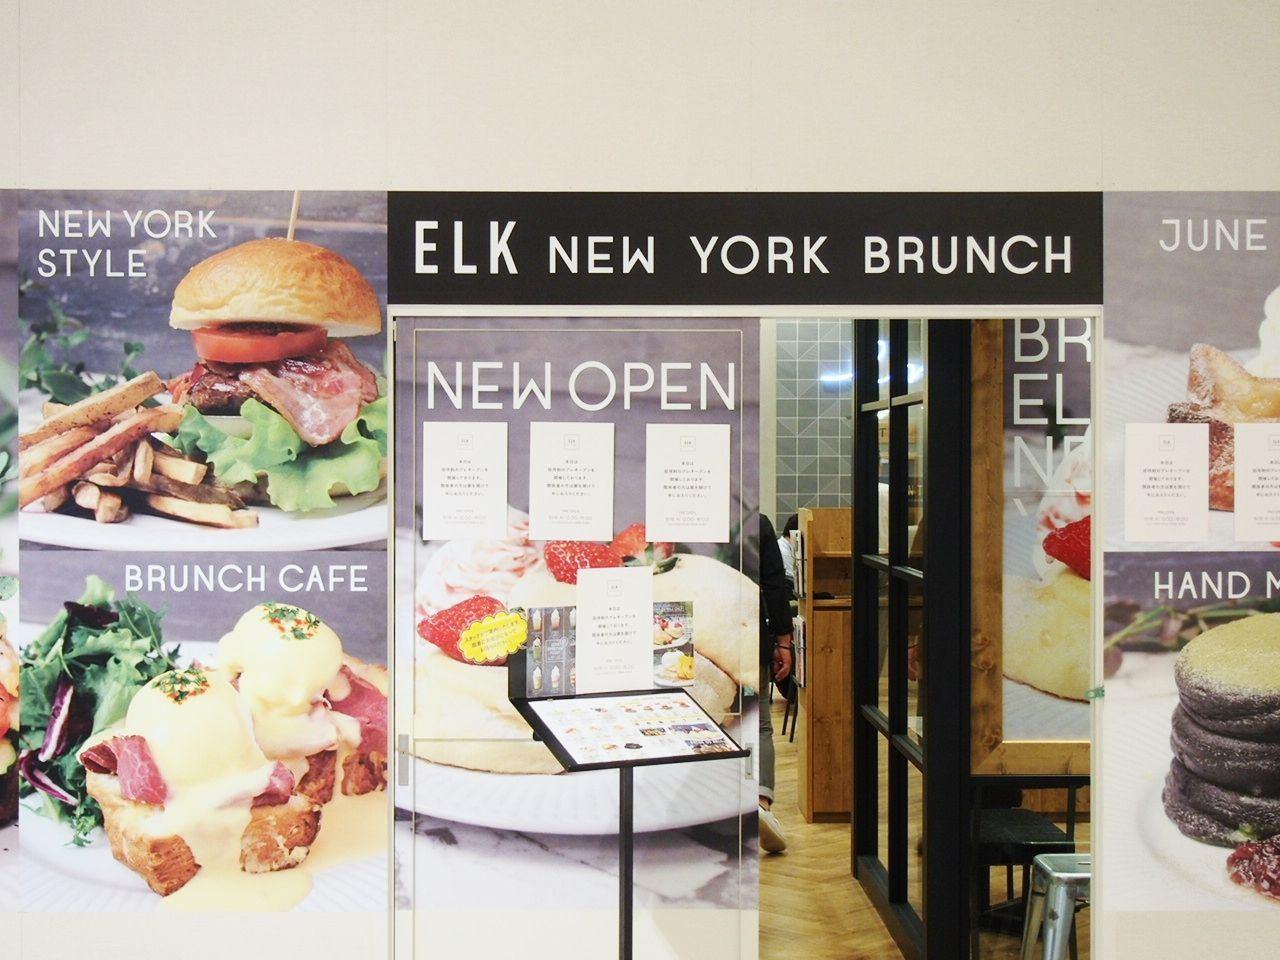 ELK NEW YORK BRUNCH 外觀